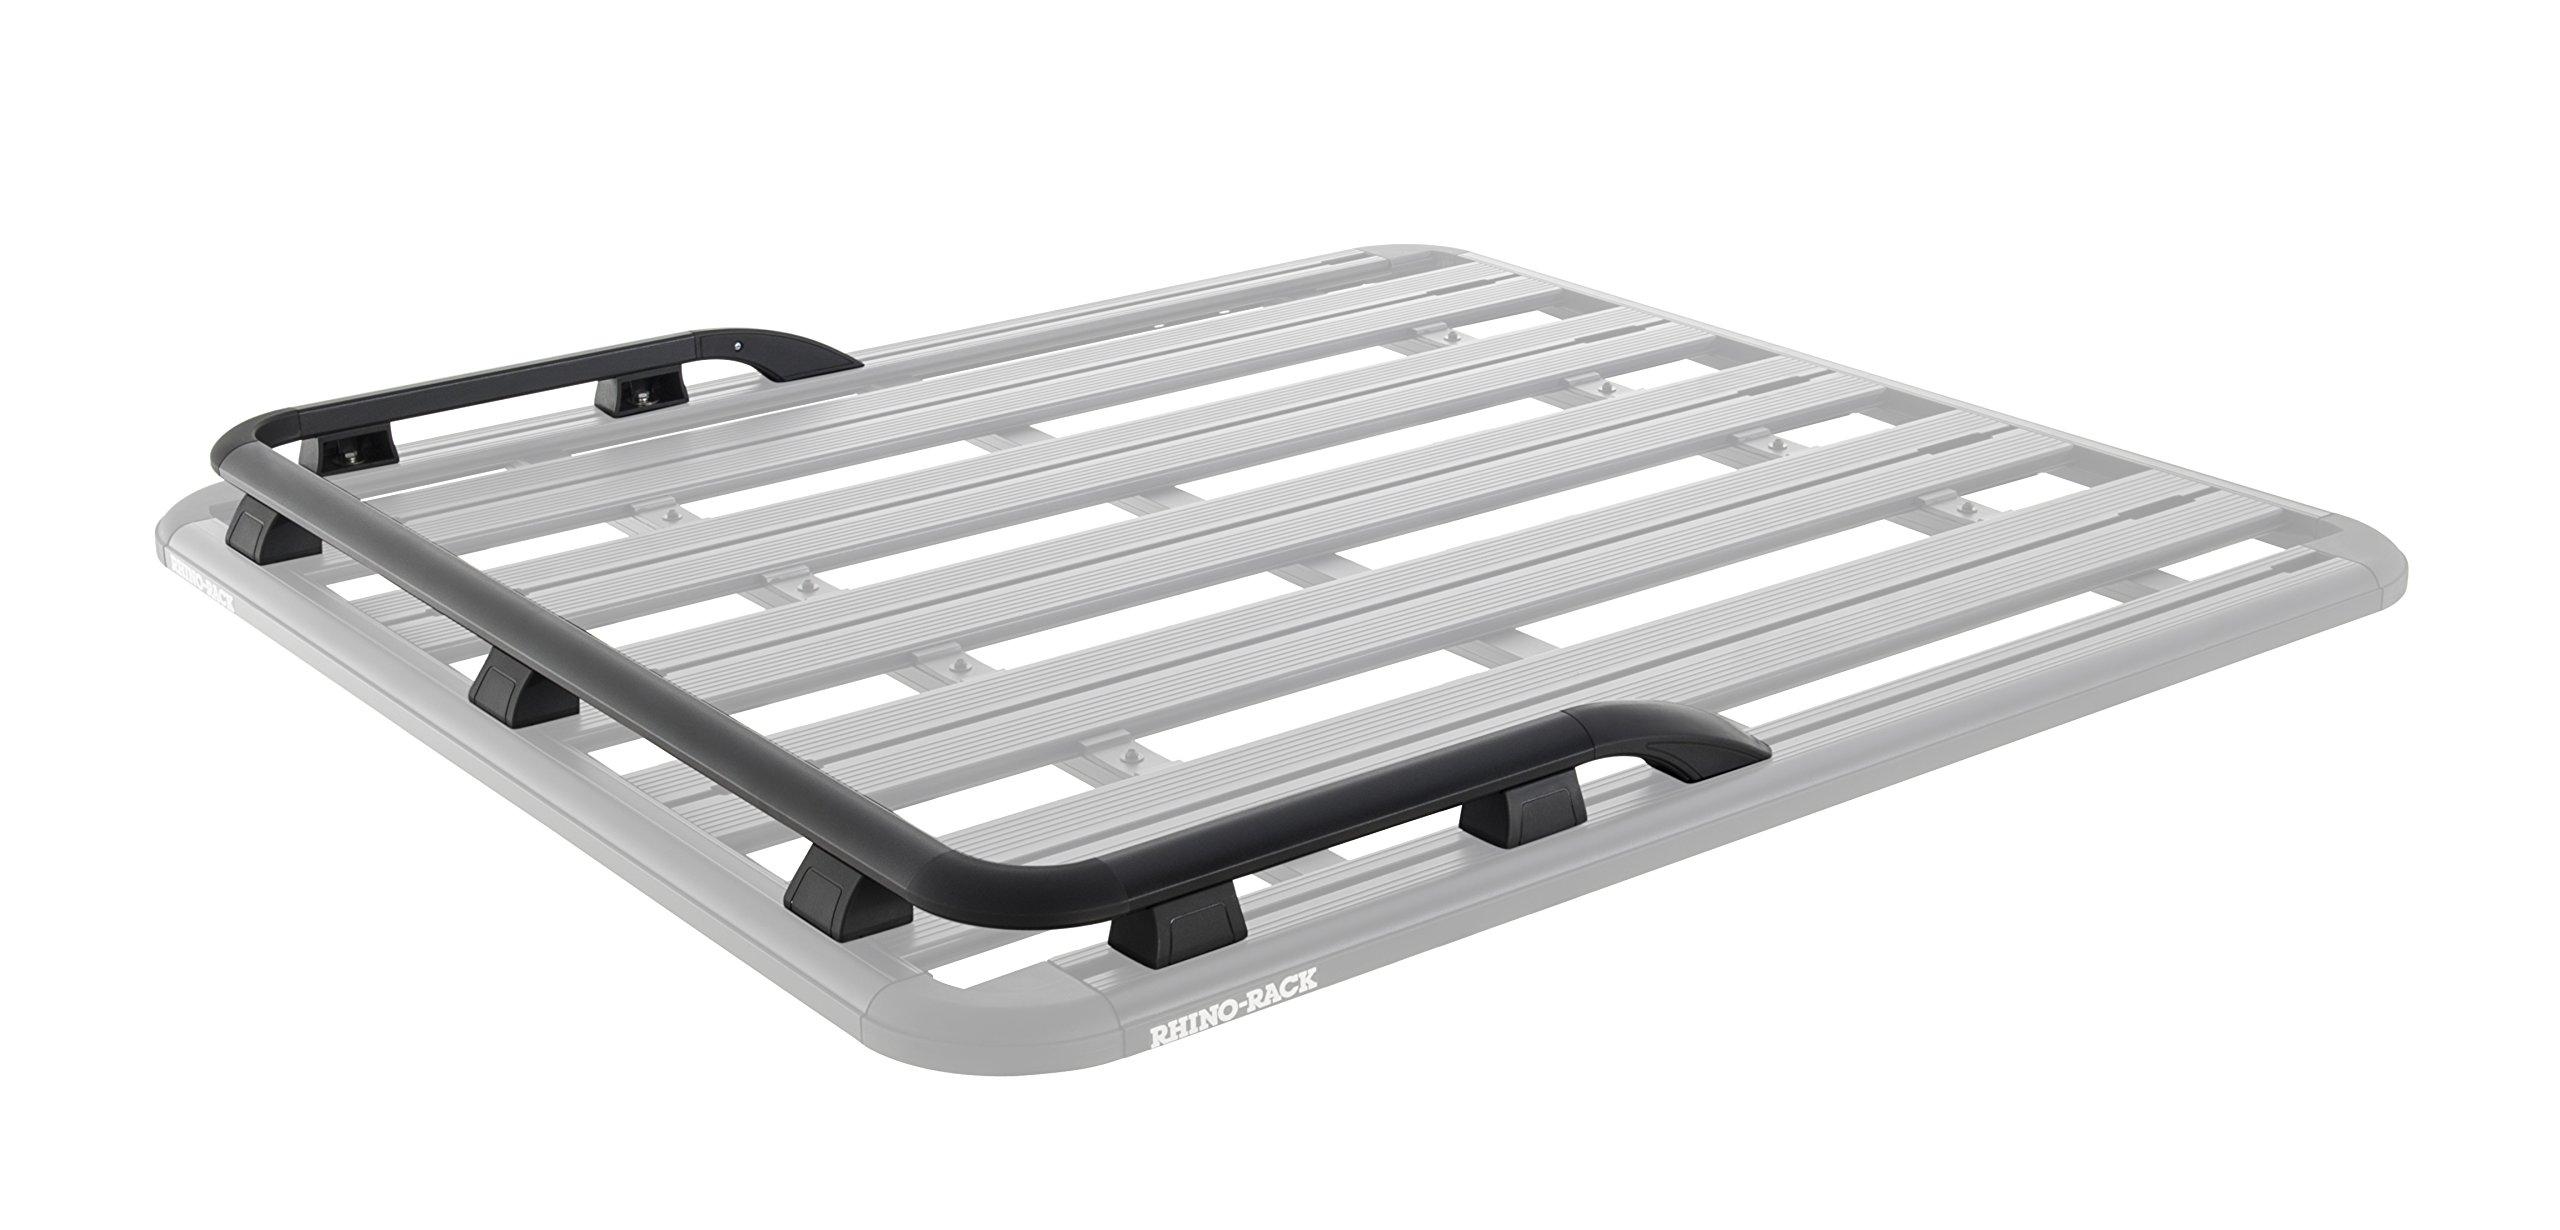 Rhino Rack Pioneer Platform Front & Side Rails (Suits 42101B/3B)